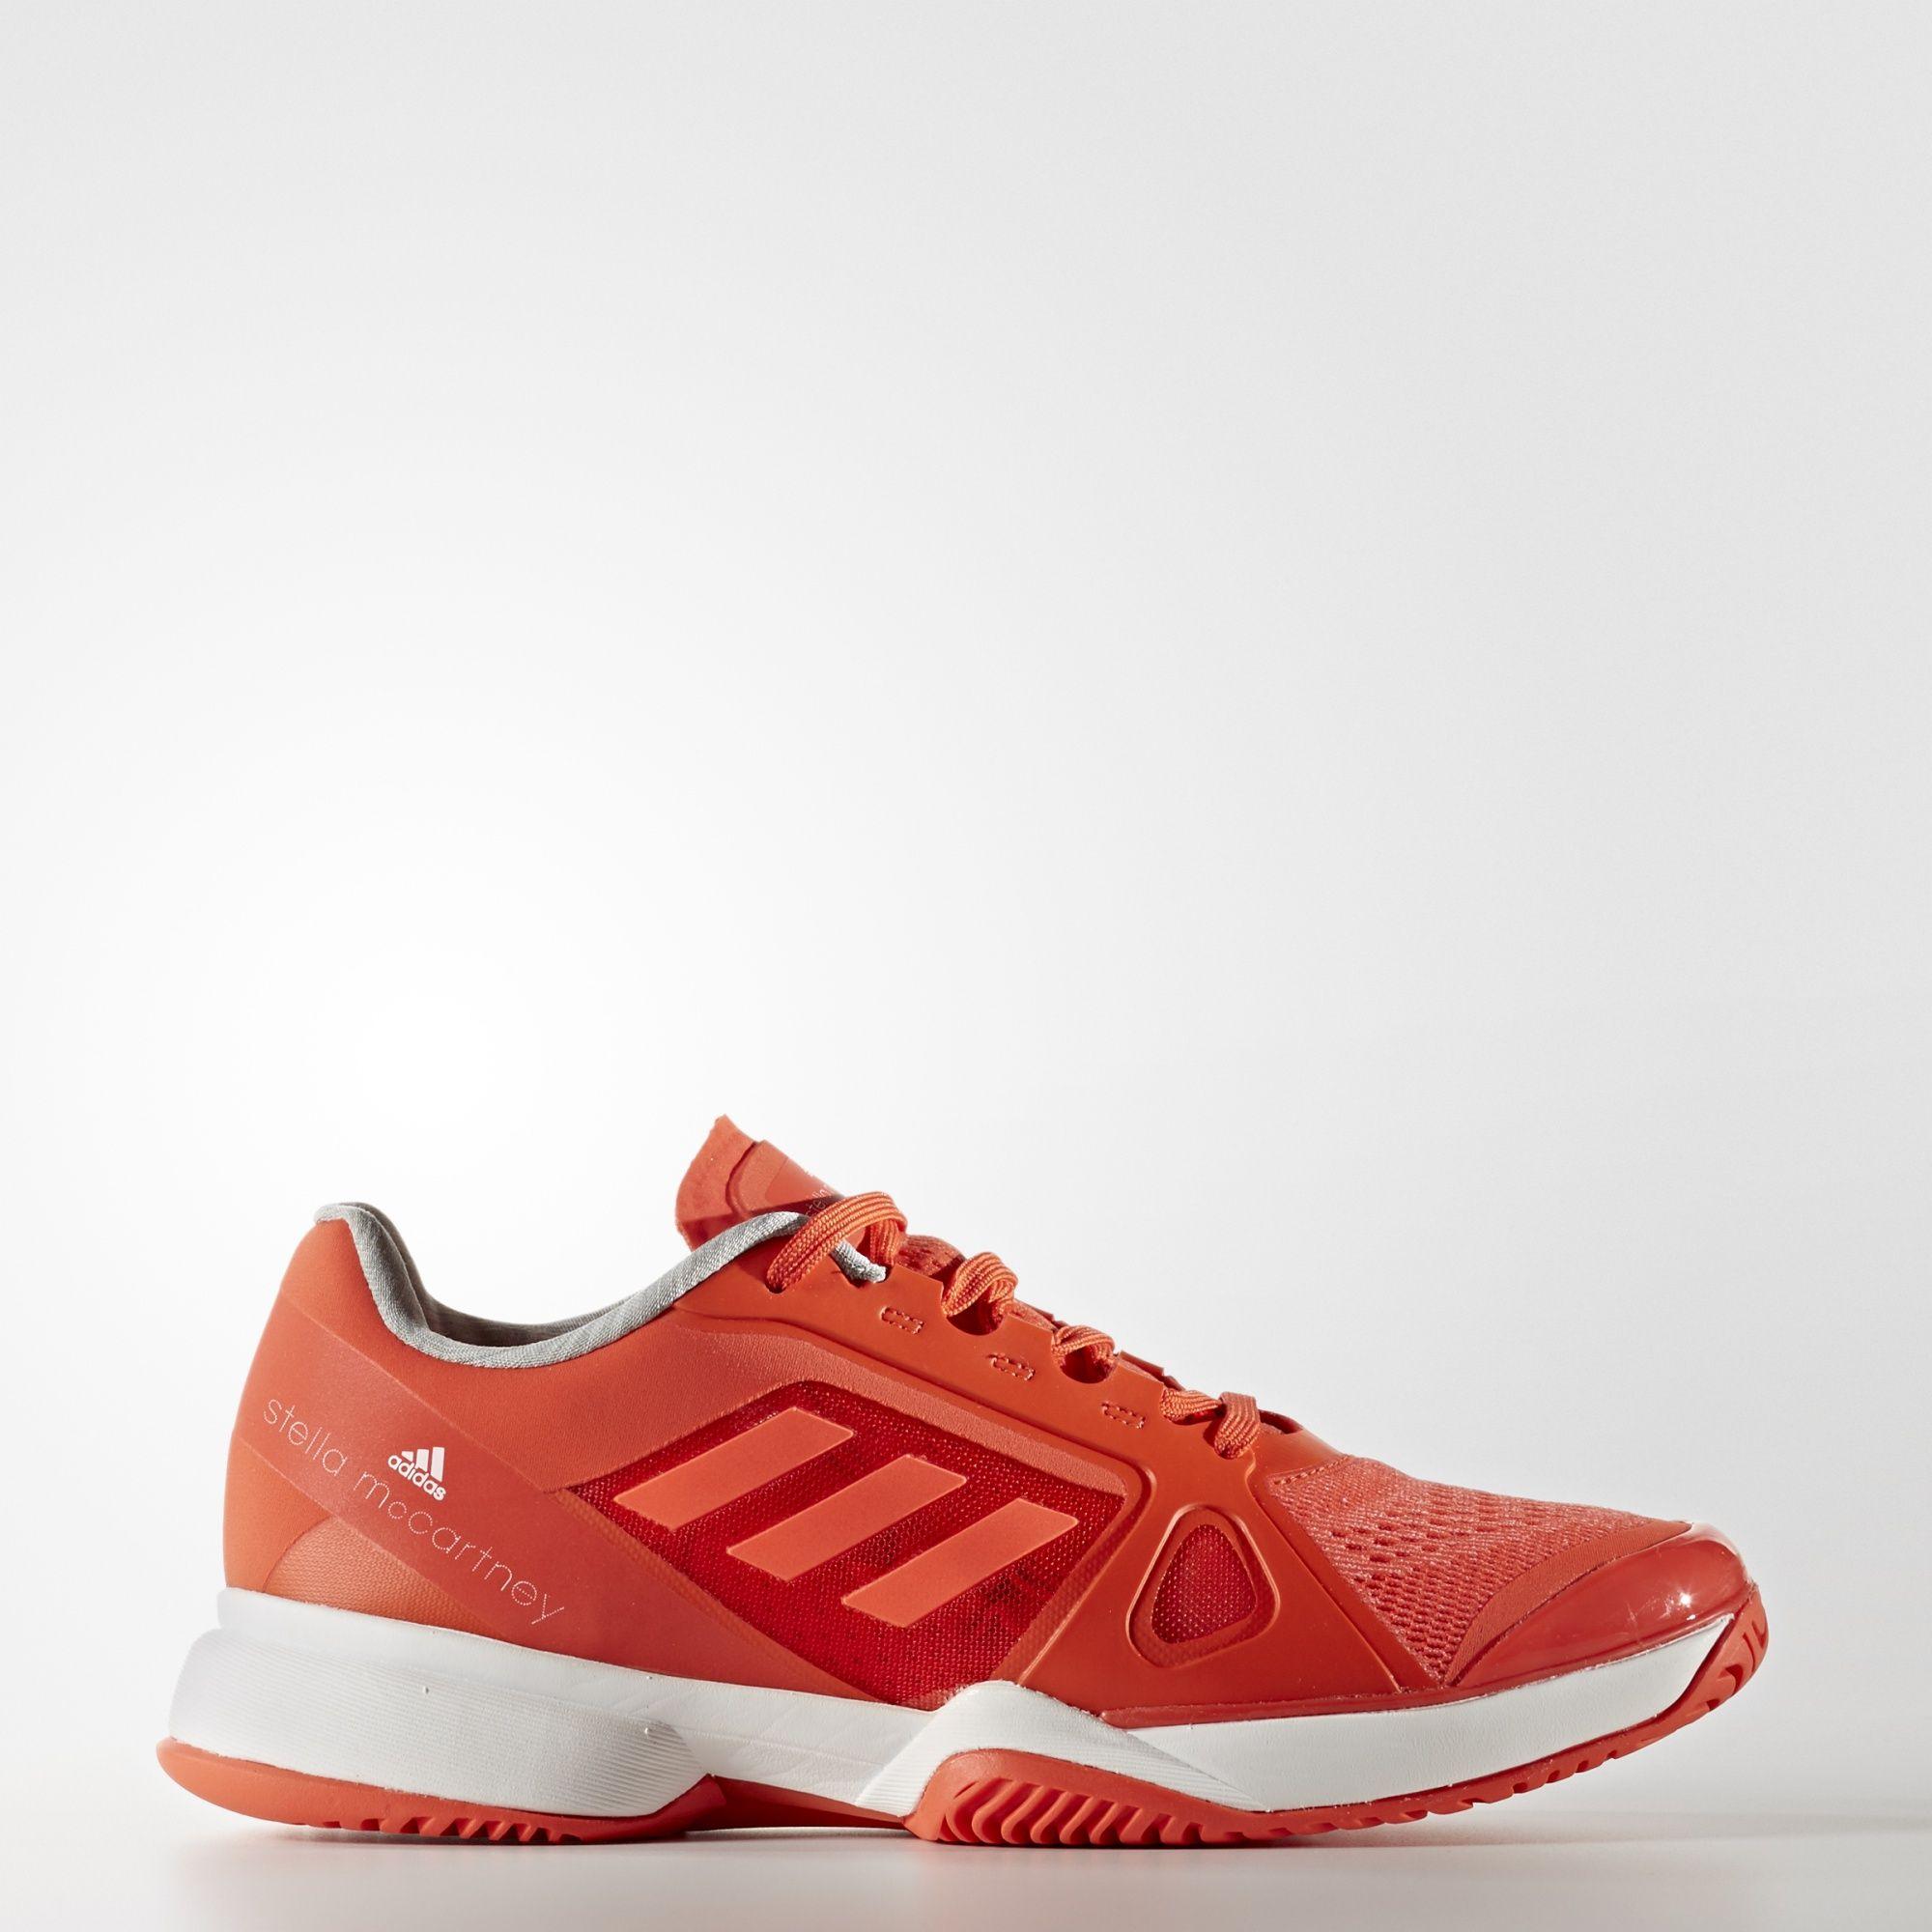 Adidas da stella mccartney barricata 2017 scarpe arancioni adidas noi